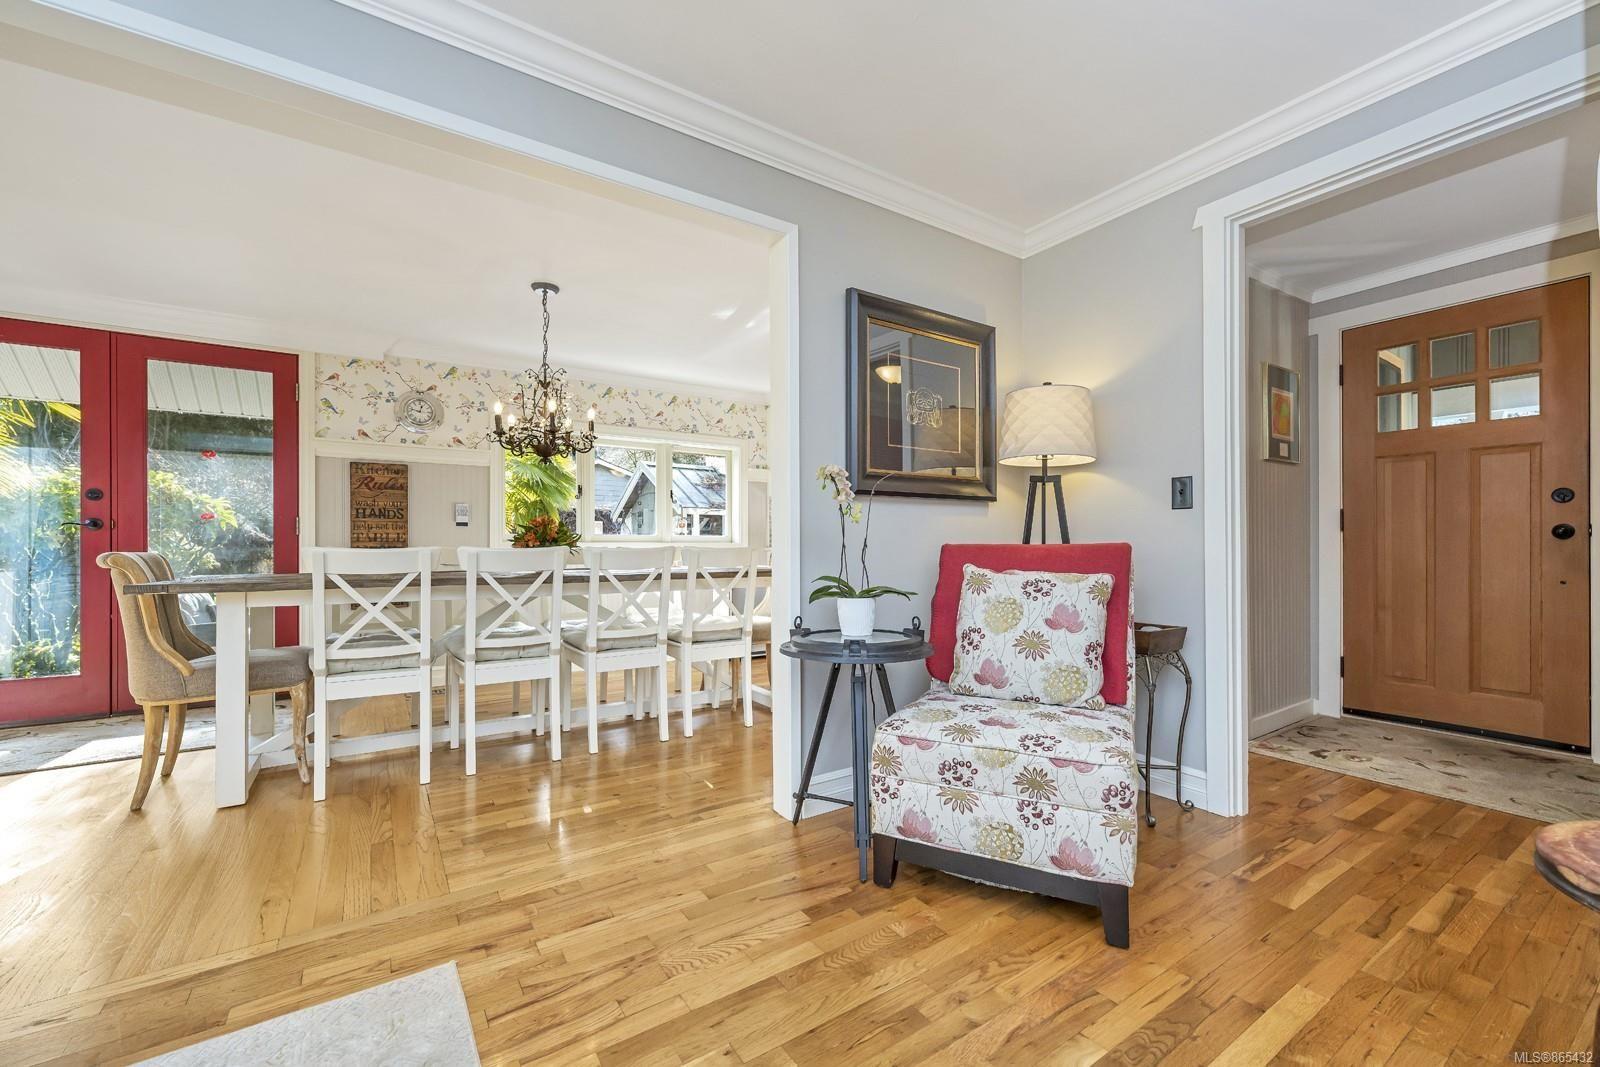 Photo 19: Photos: 6734 Drummond Dr in : Du East Duncan House for sale (Duncan)  : MLS®# 865432